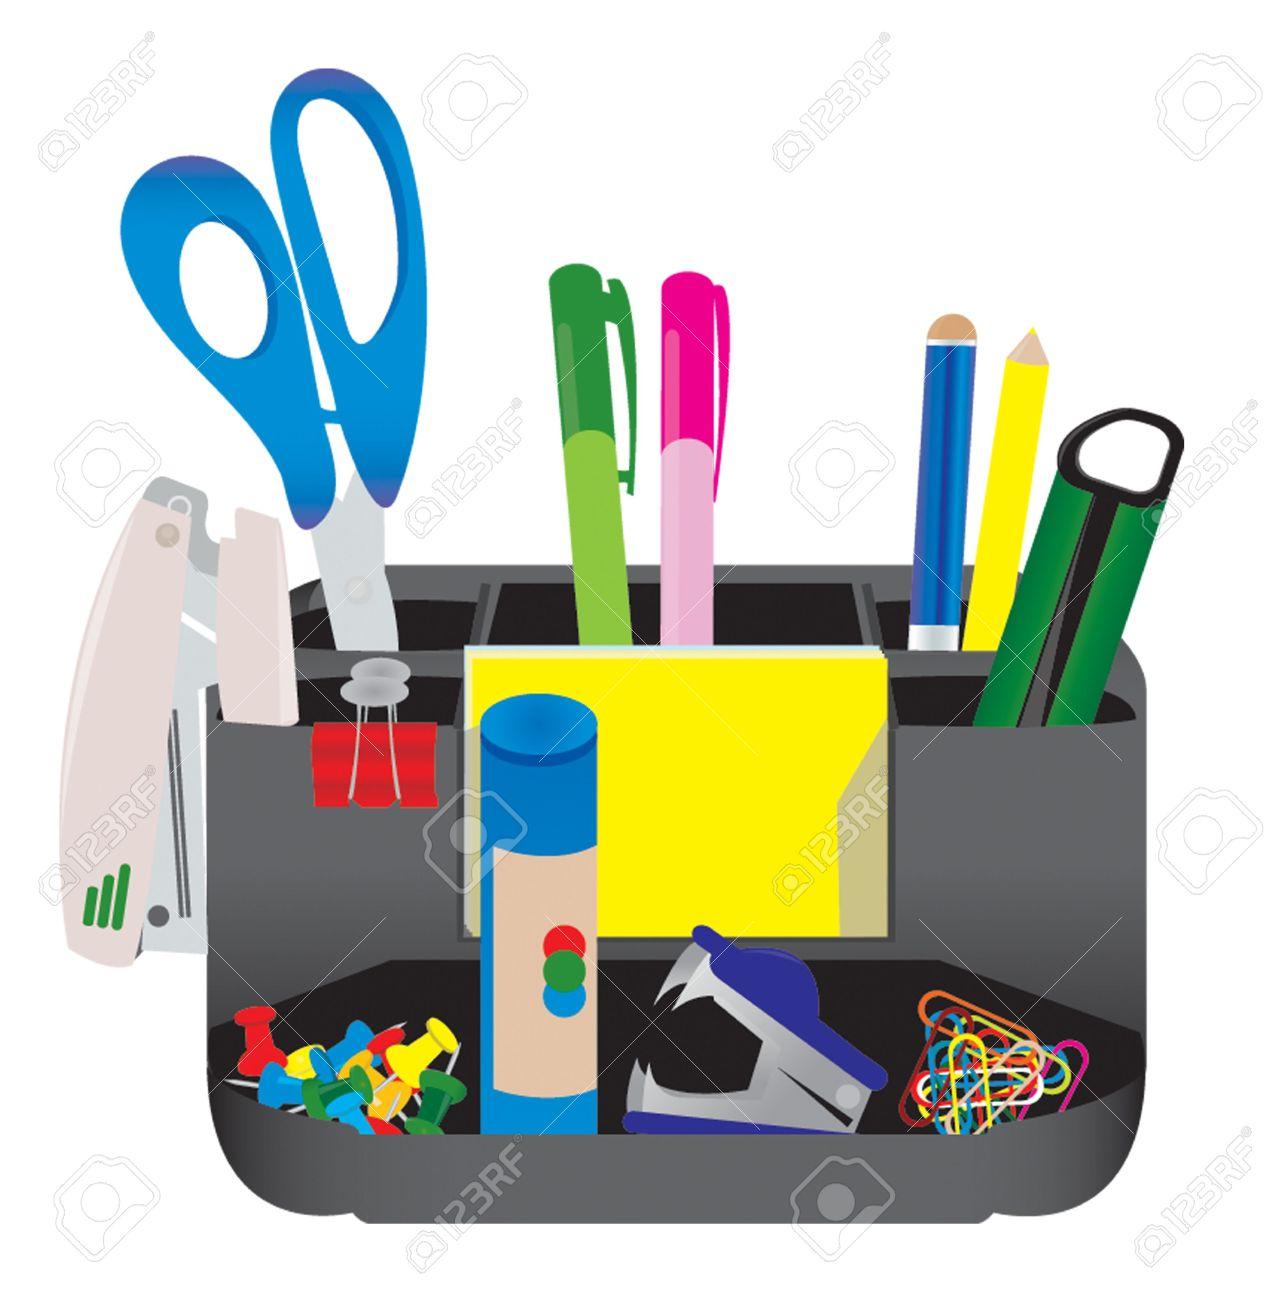 Office tool clipart clipground for Herramientas de oficina